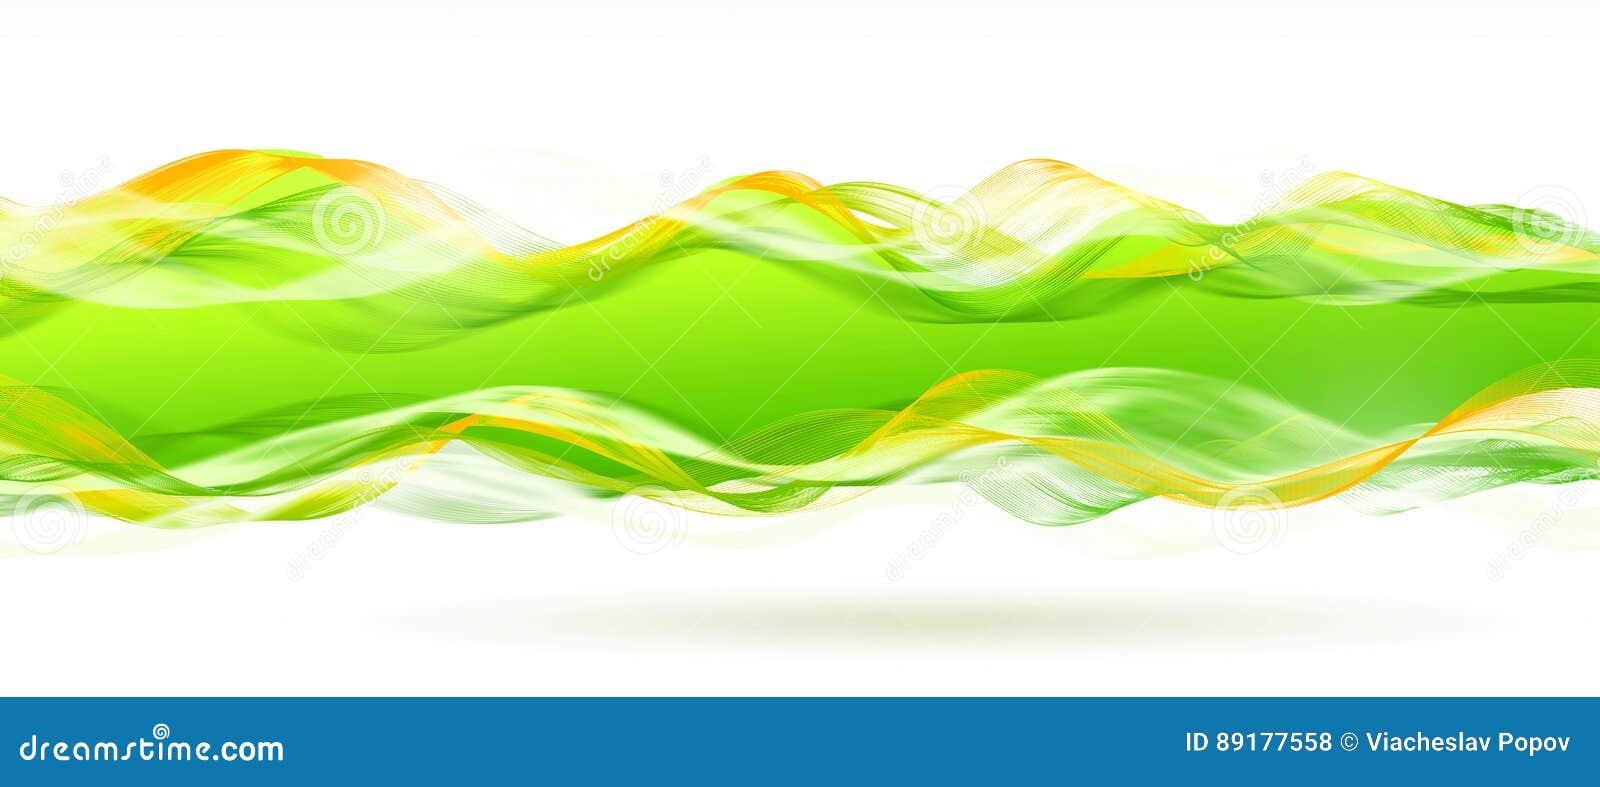 Lines shiny green mosaic